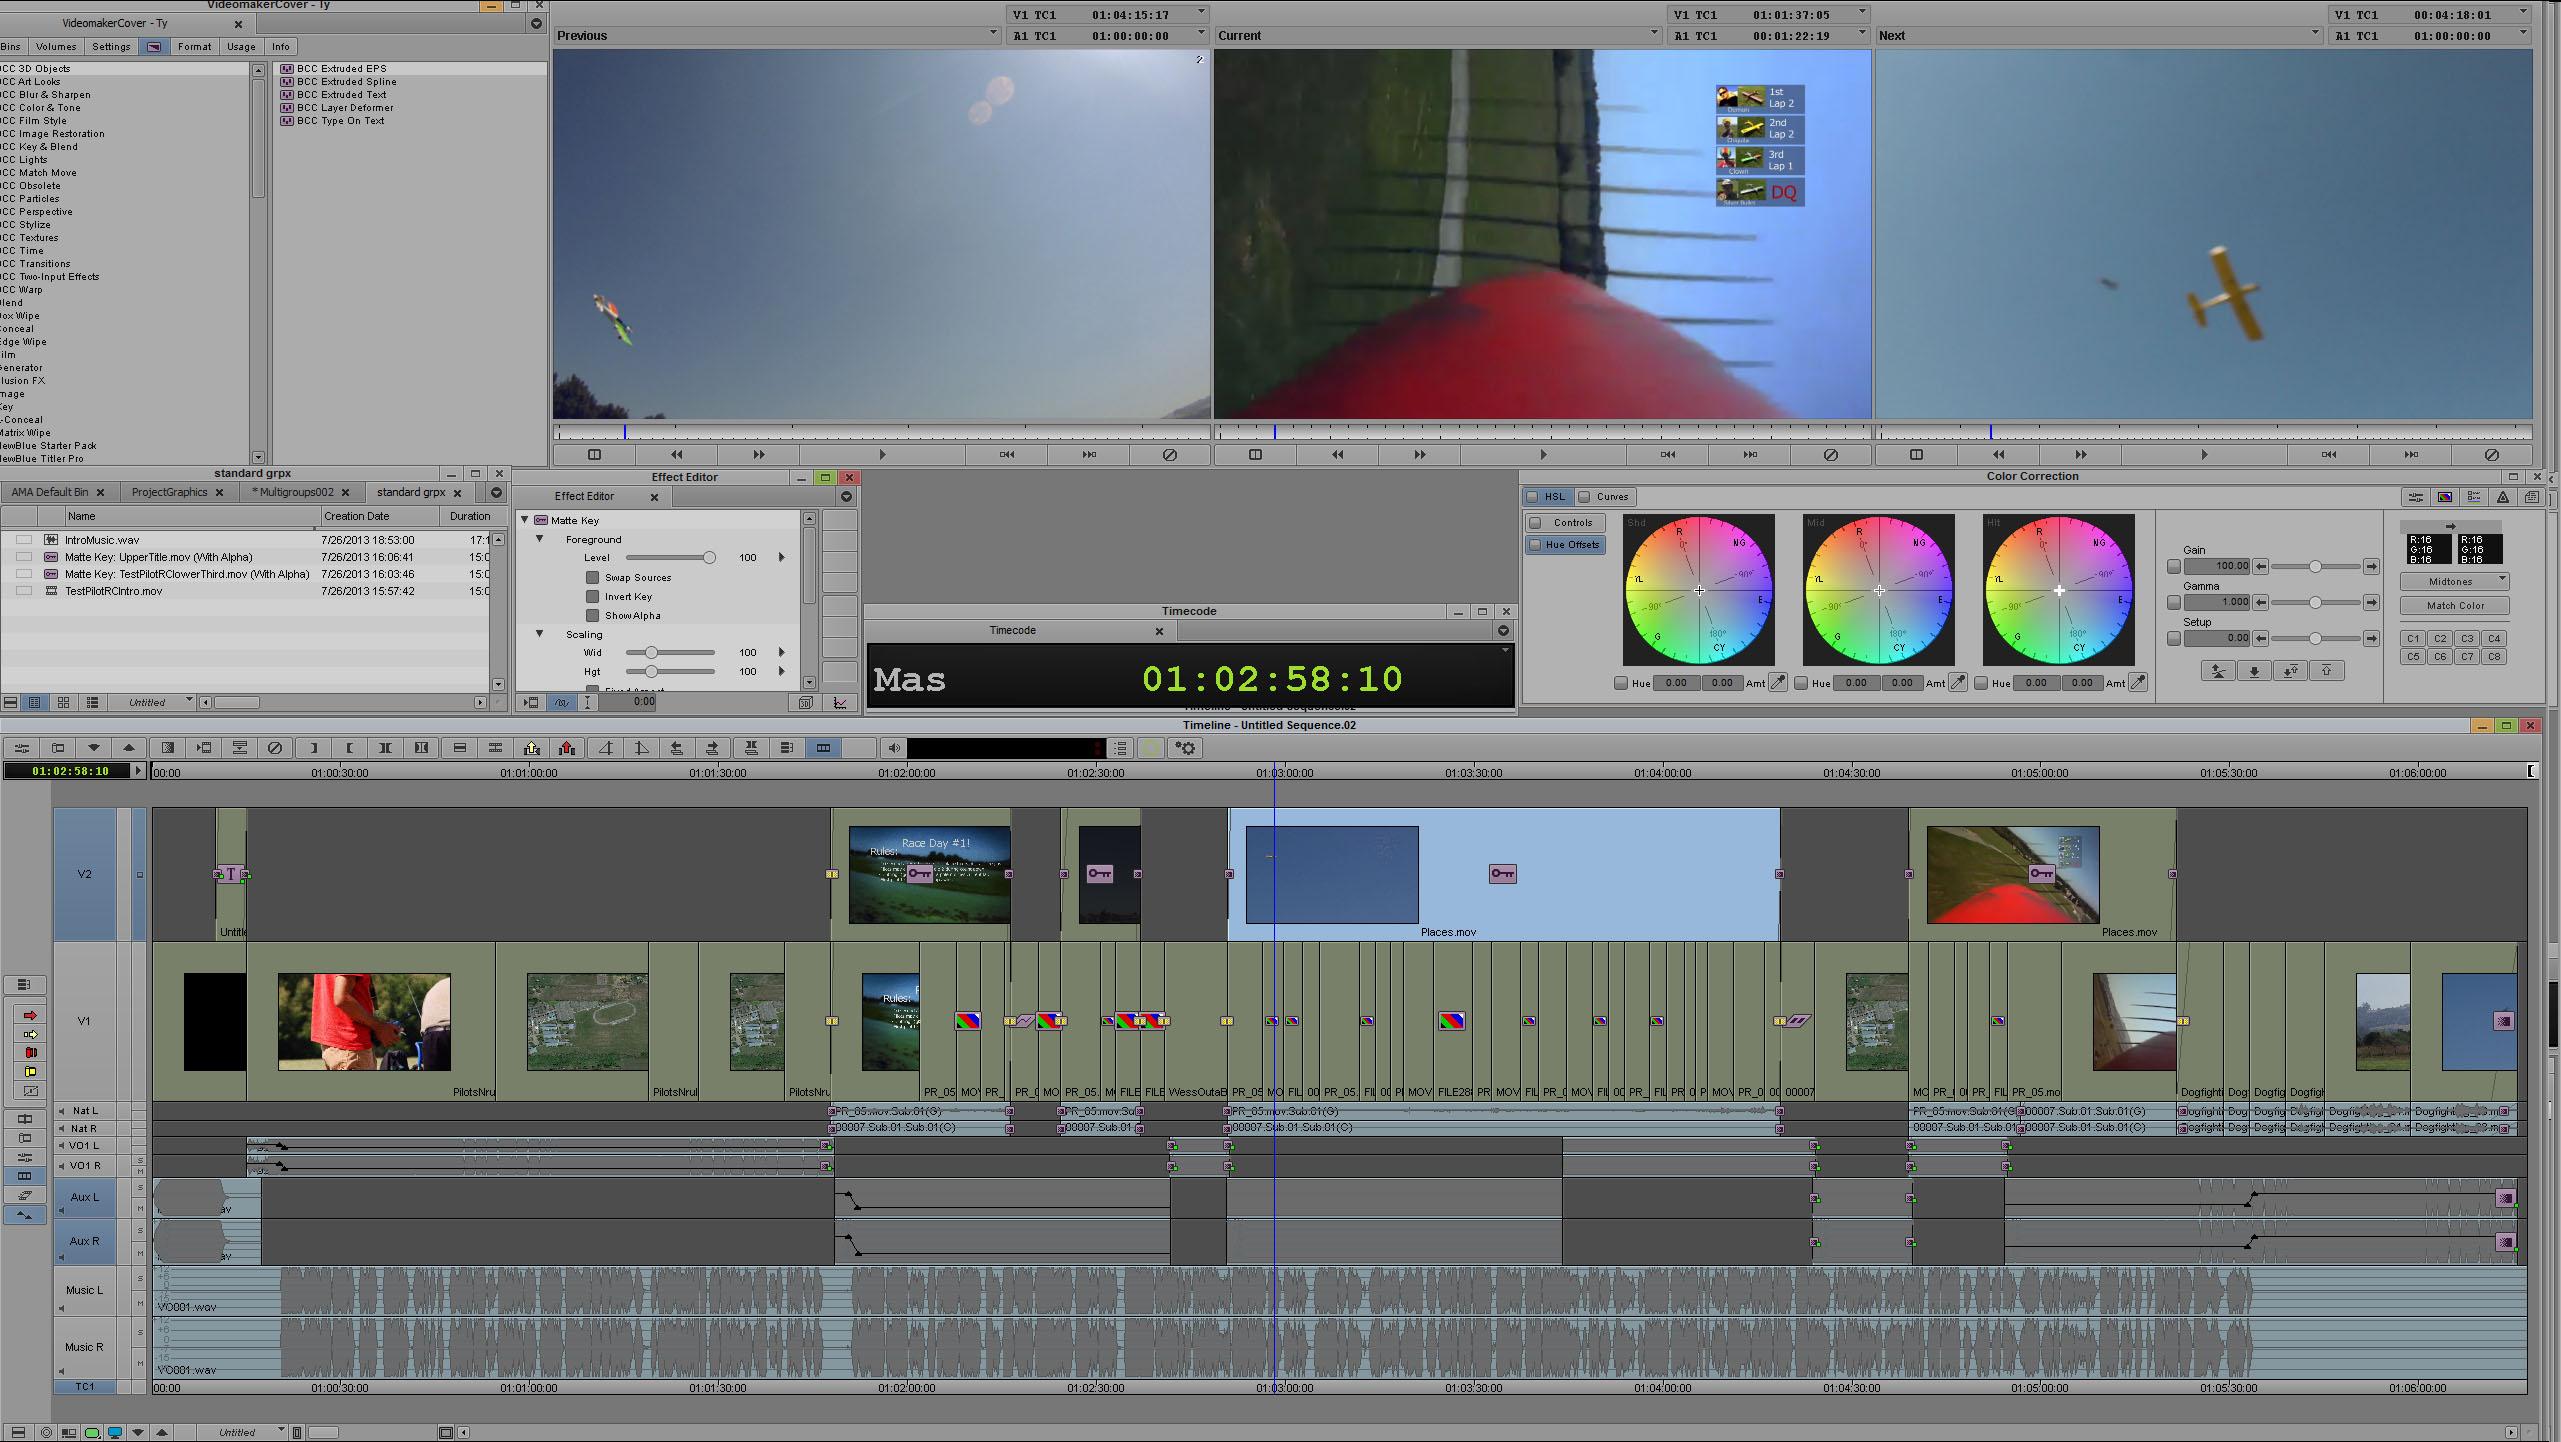 Editing & Production Software Media Composer 6.5 Upgrade Avid ...